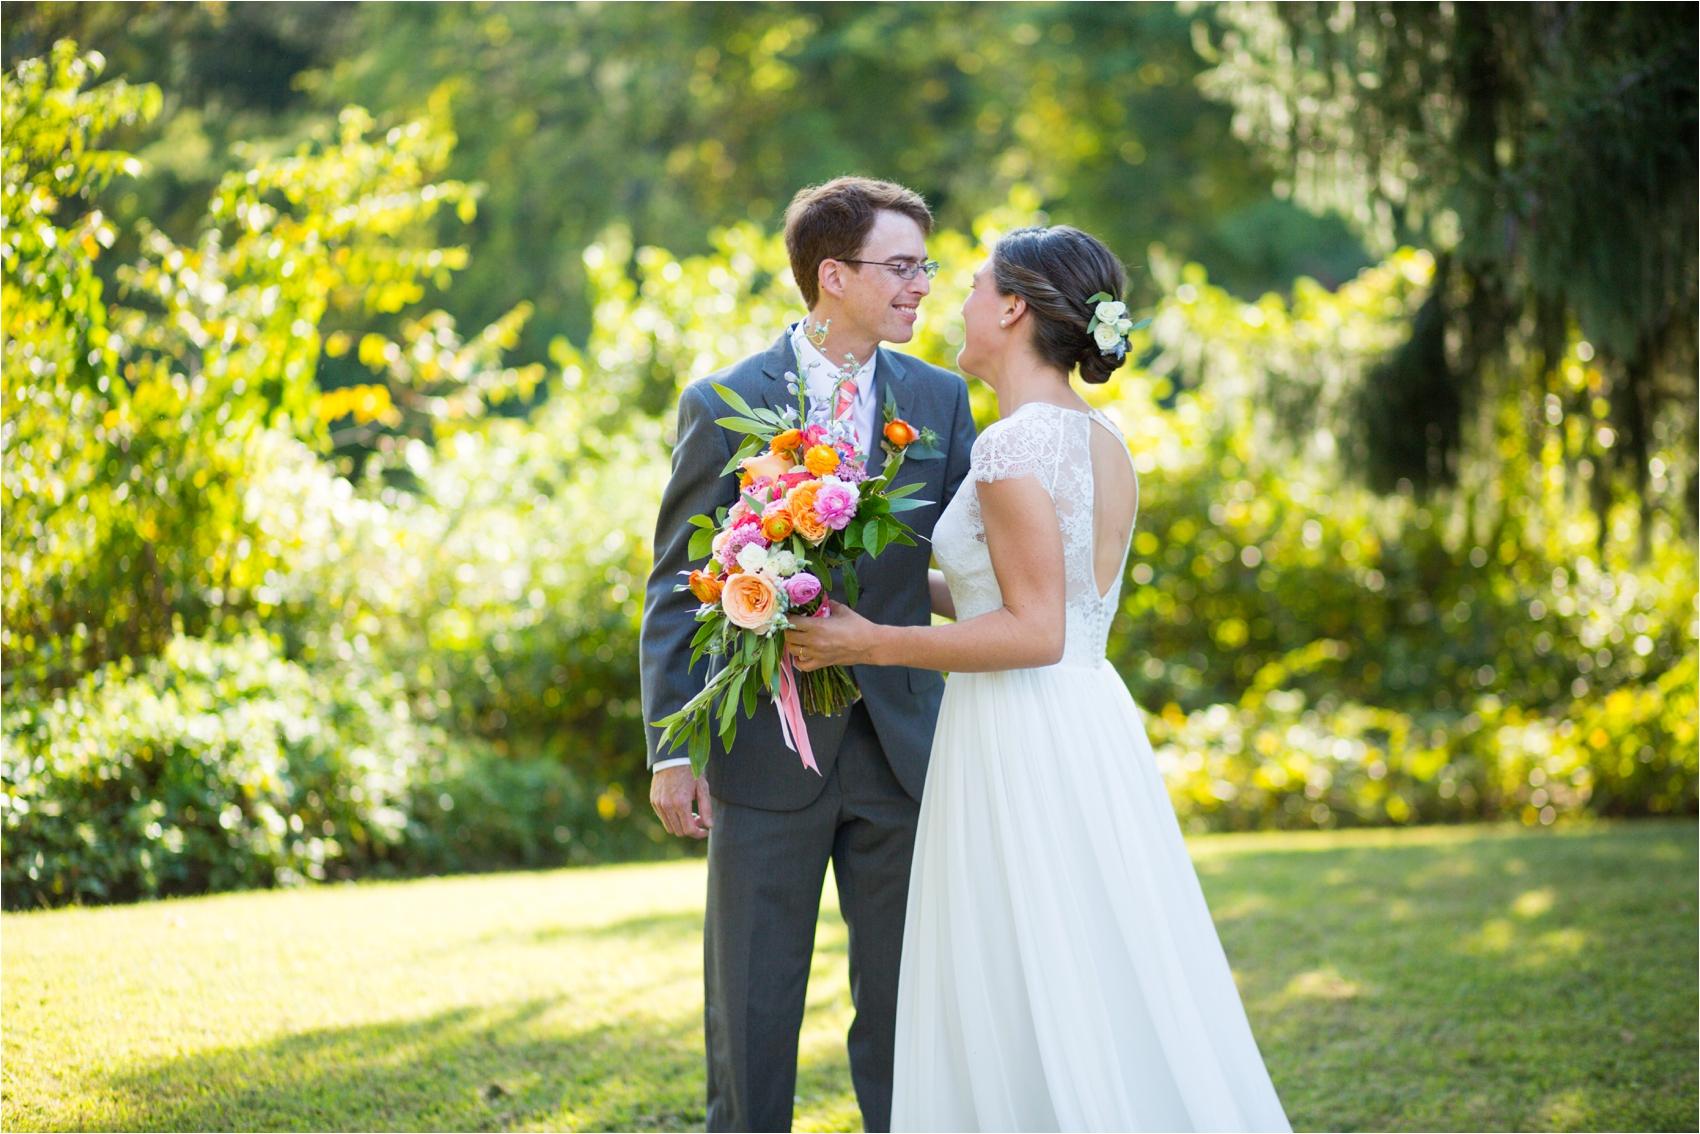 Feather-and-Oak-Rainforest-Trust-Virginia-Wedding-0578.jpg